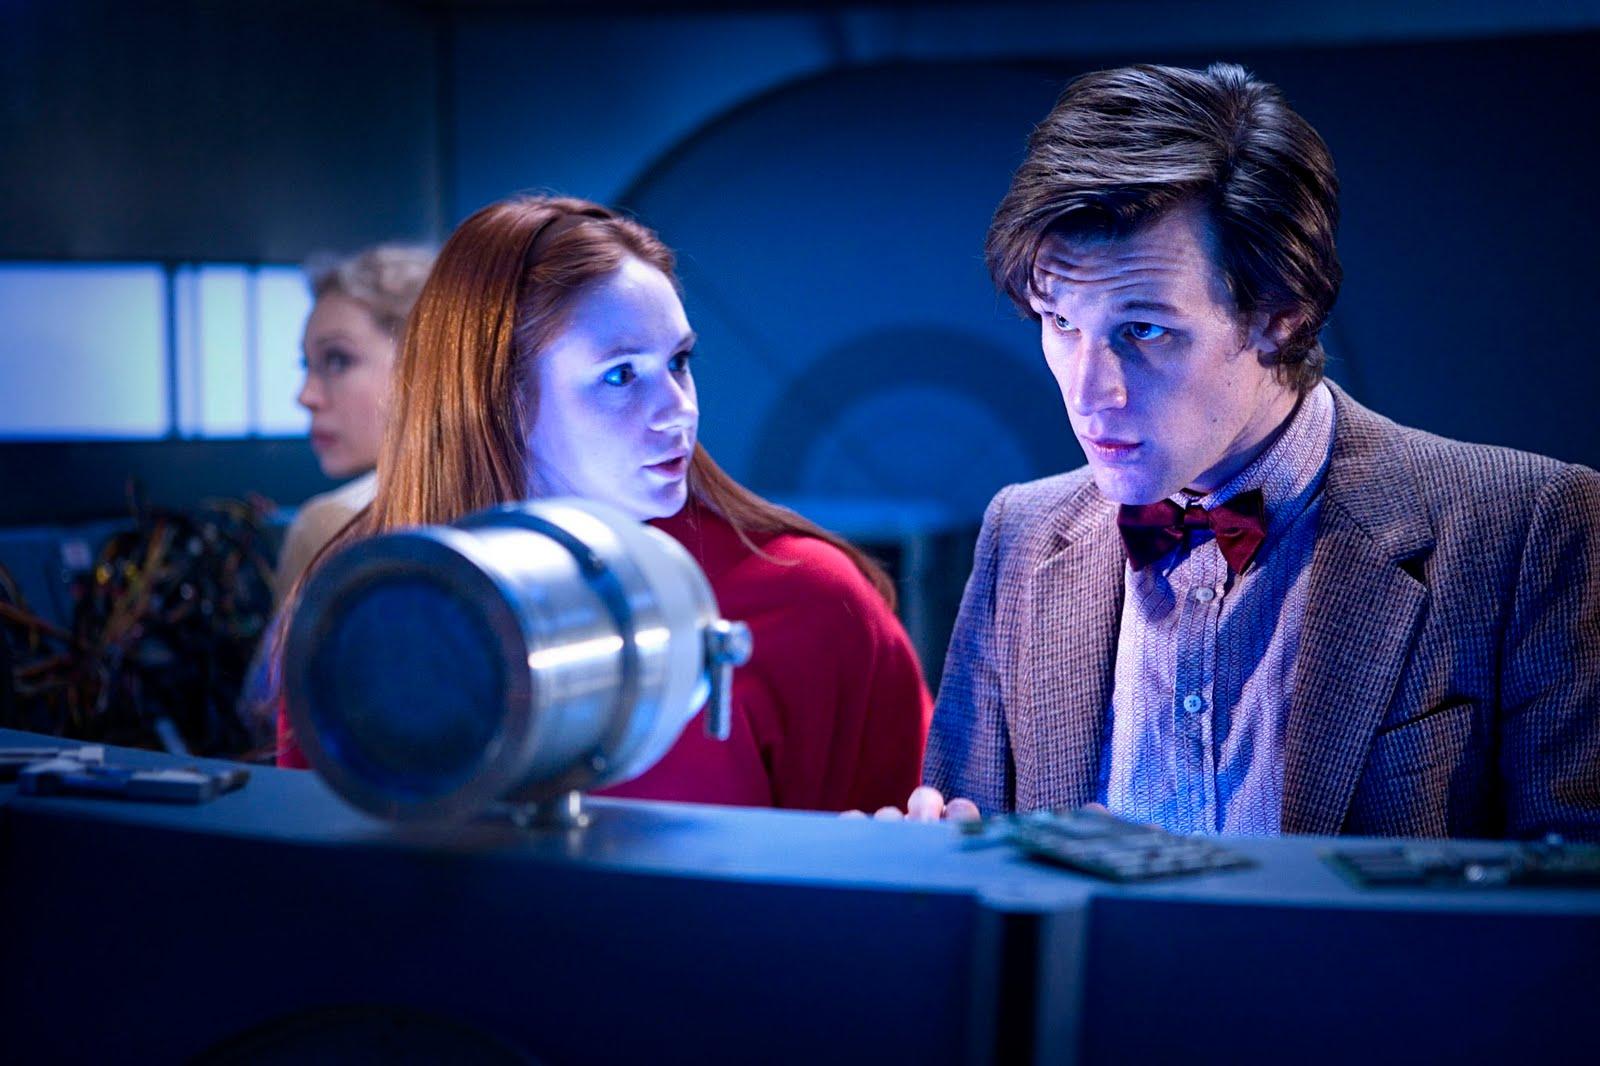 Doctor Who 2005 Temporada 02 Audio Español Latino